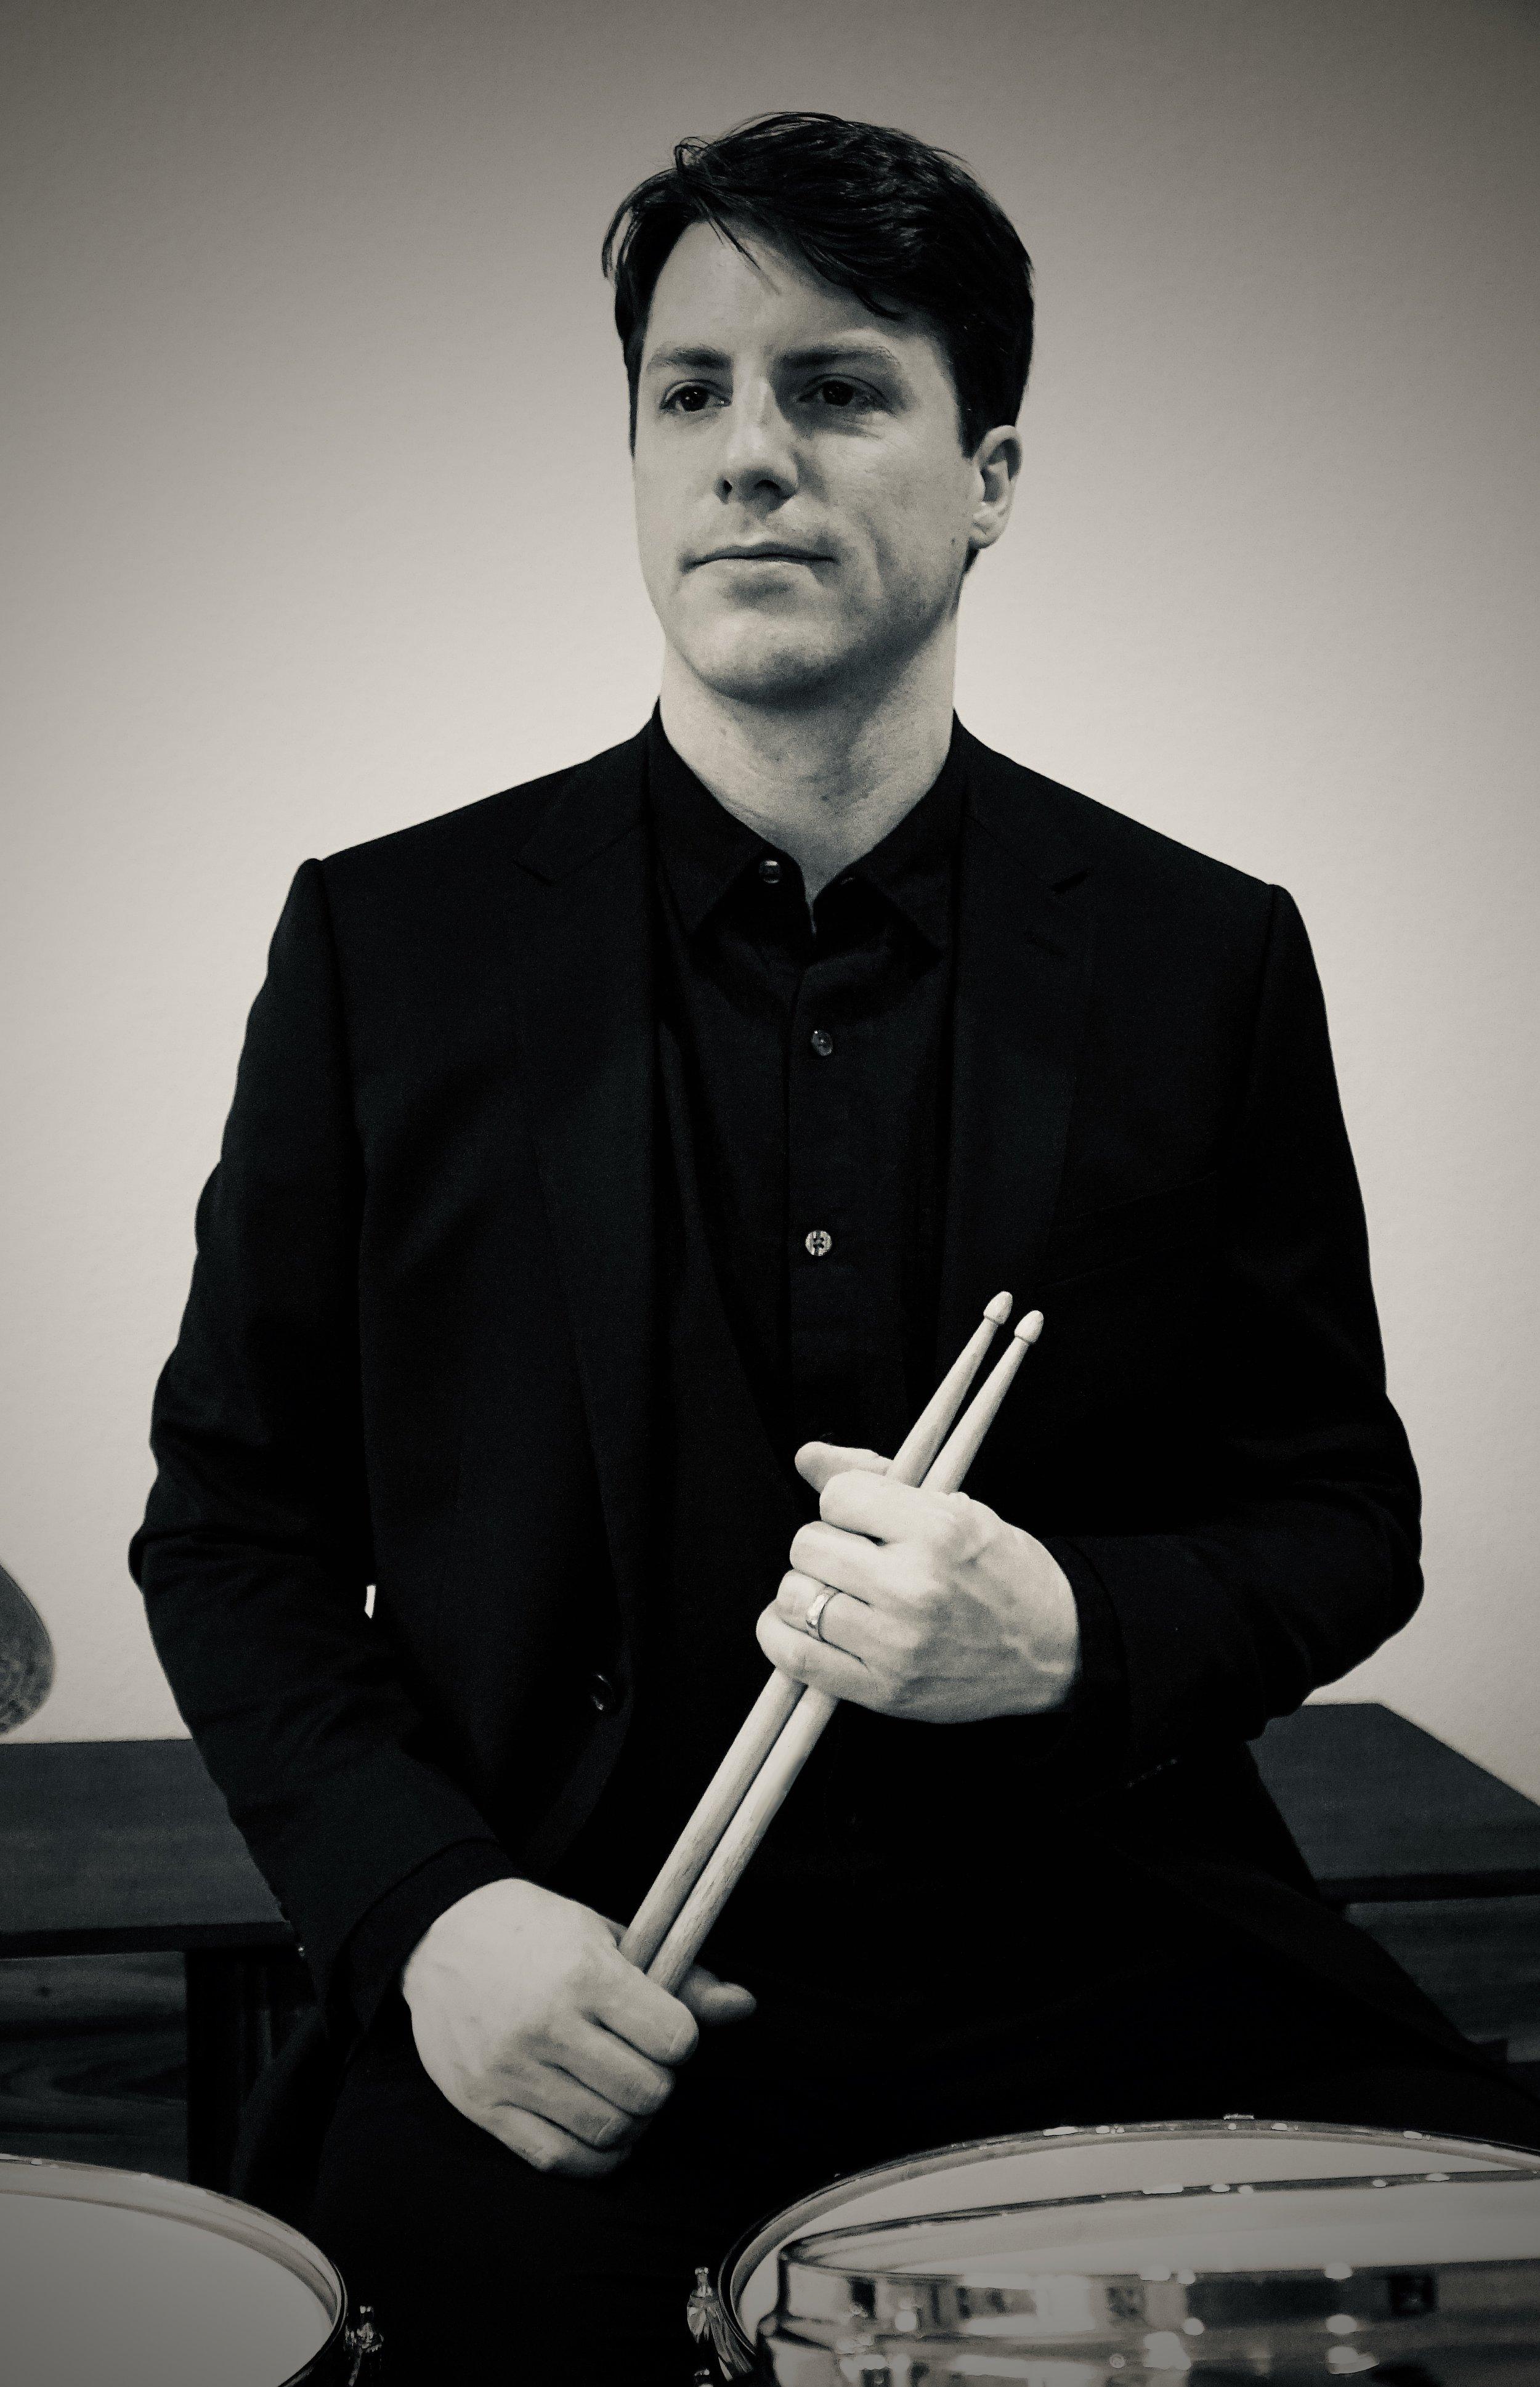 Drums & Music - Live/Studio/Lessons